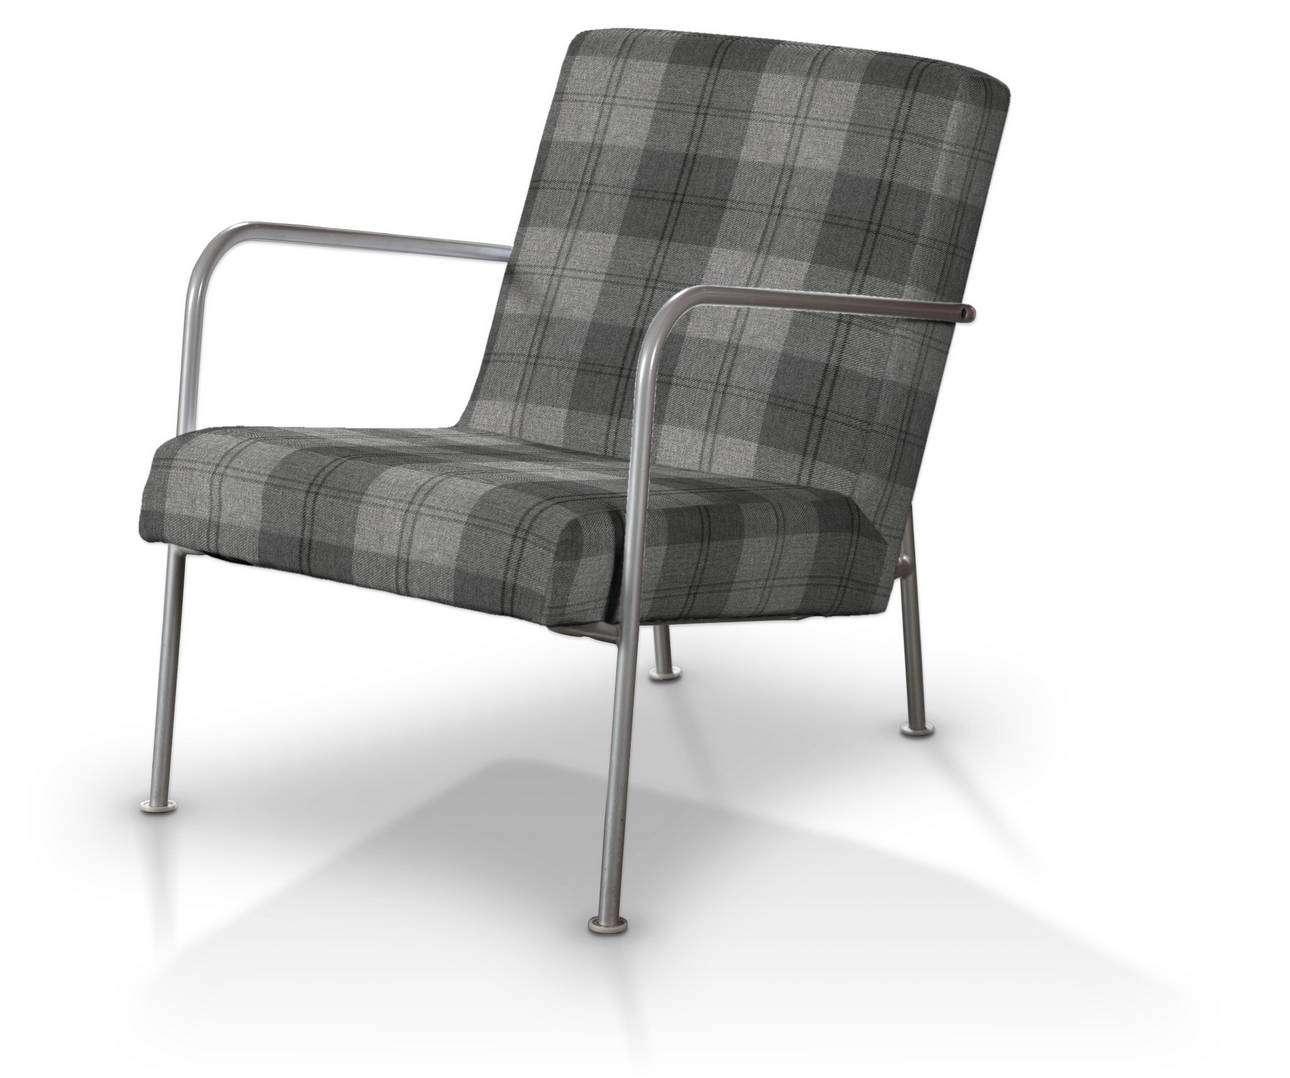 Ikea PS Sesselbezug von der Kollektion Edinburgh , Stoff: 115-75